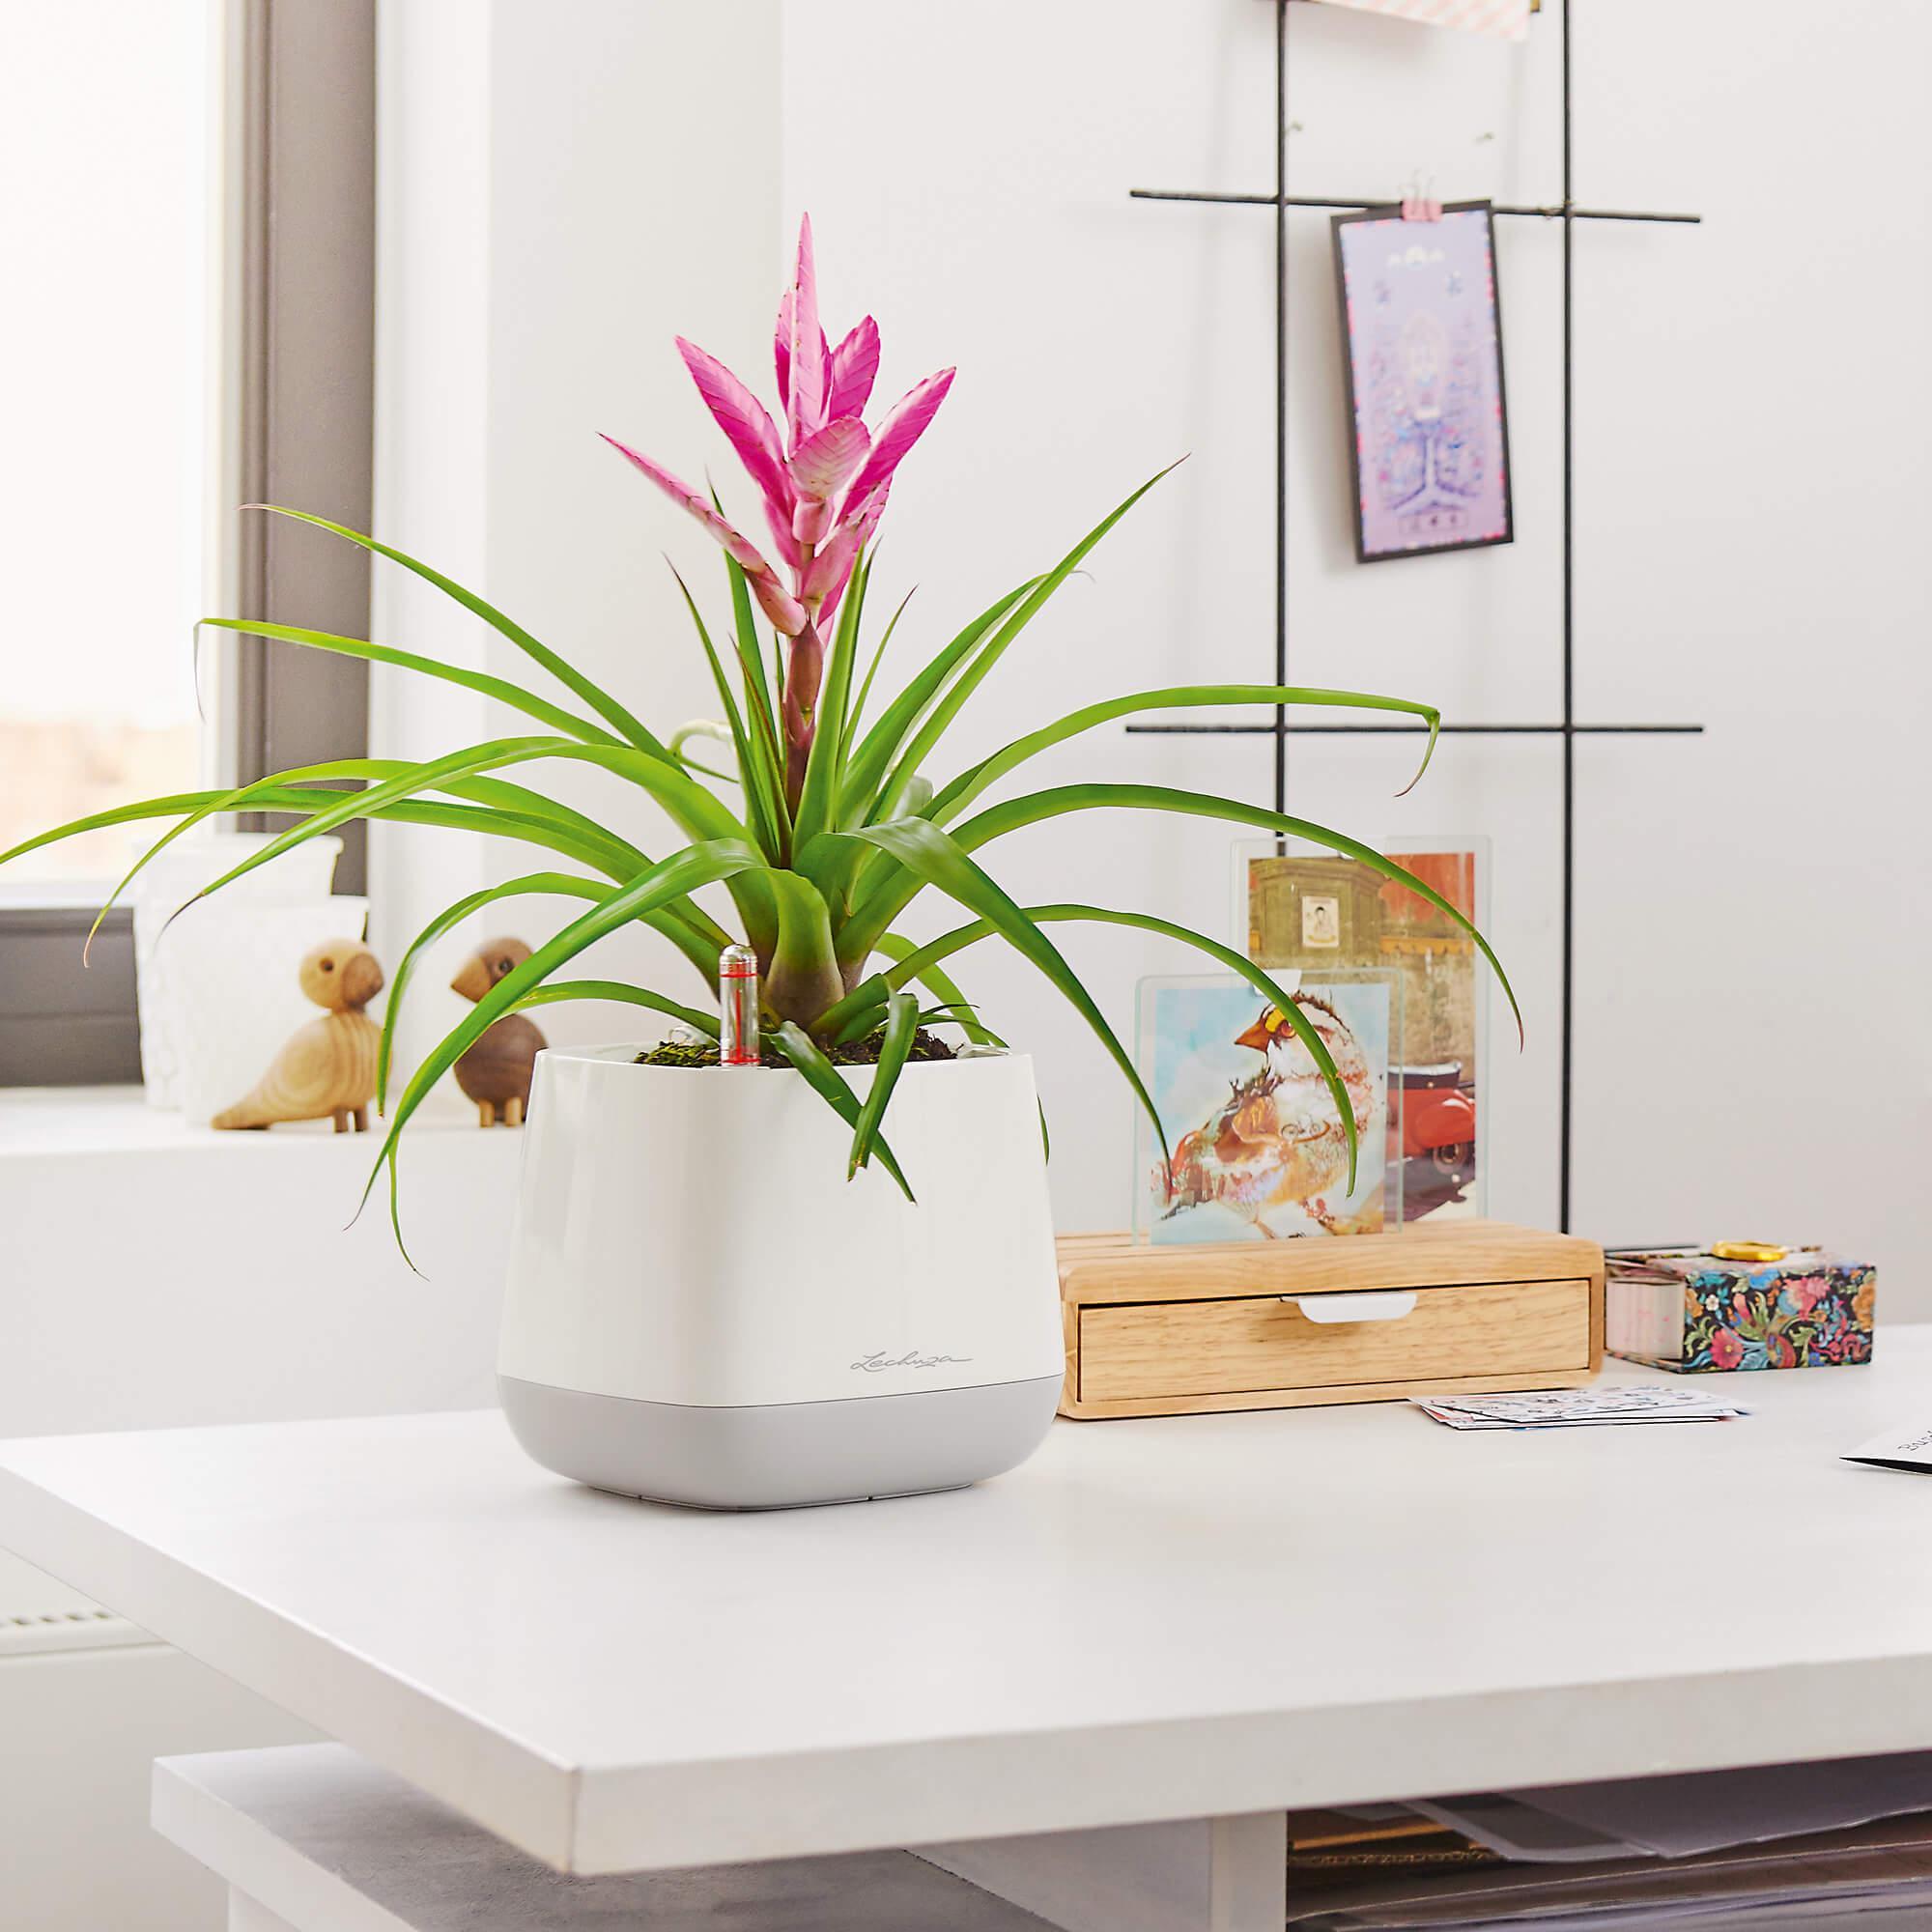 YULA planter white/gray semi-gloss - Image 5